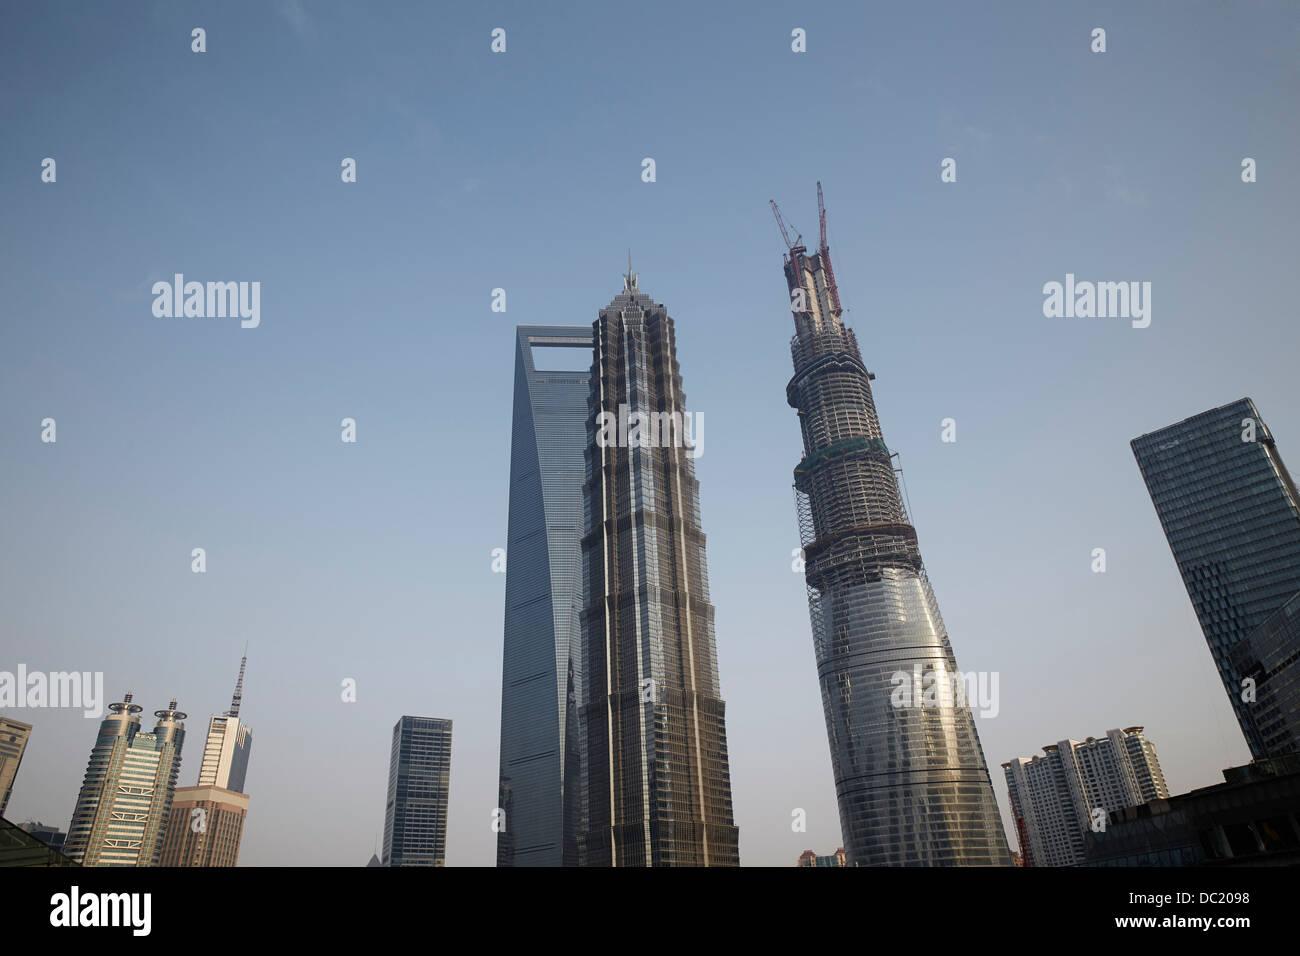 Shanghai Tower, Jin Mao Tower and Shanghai World Financial Center, Shanghai, China - Stock Image